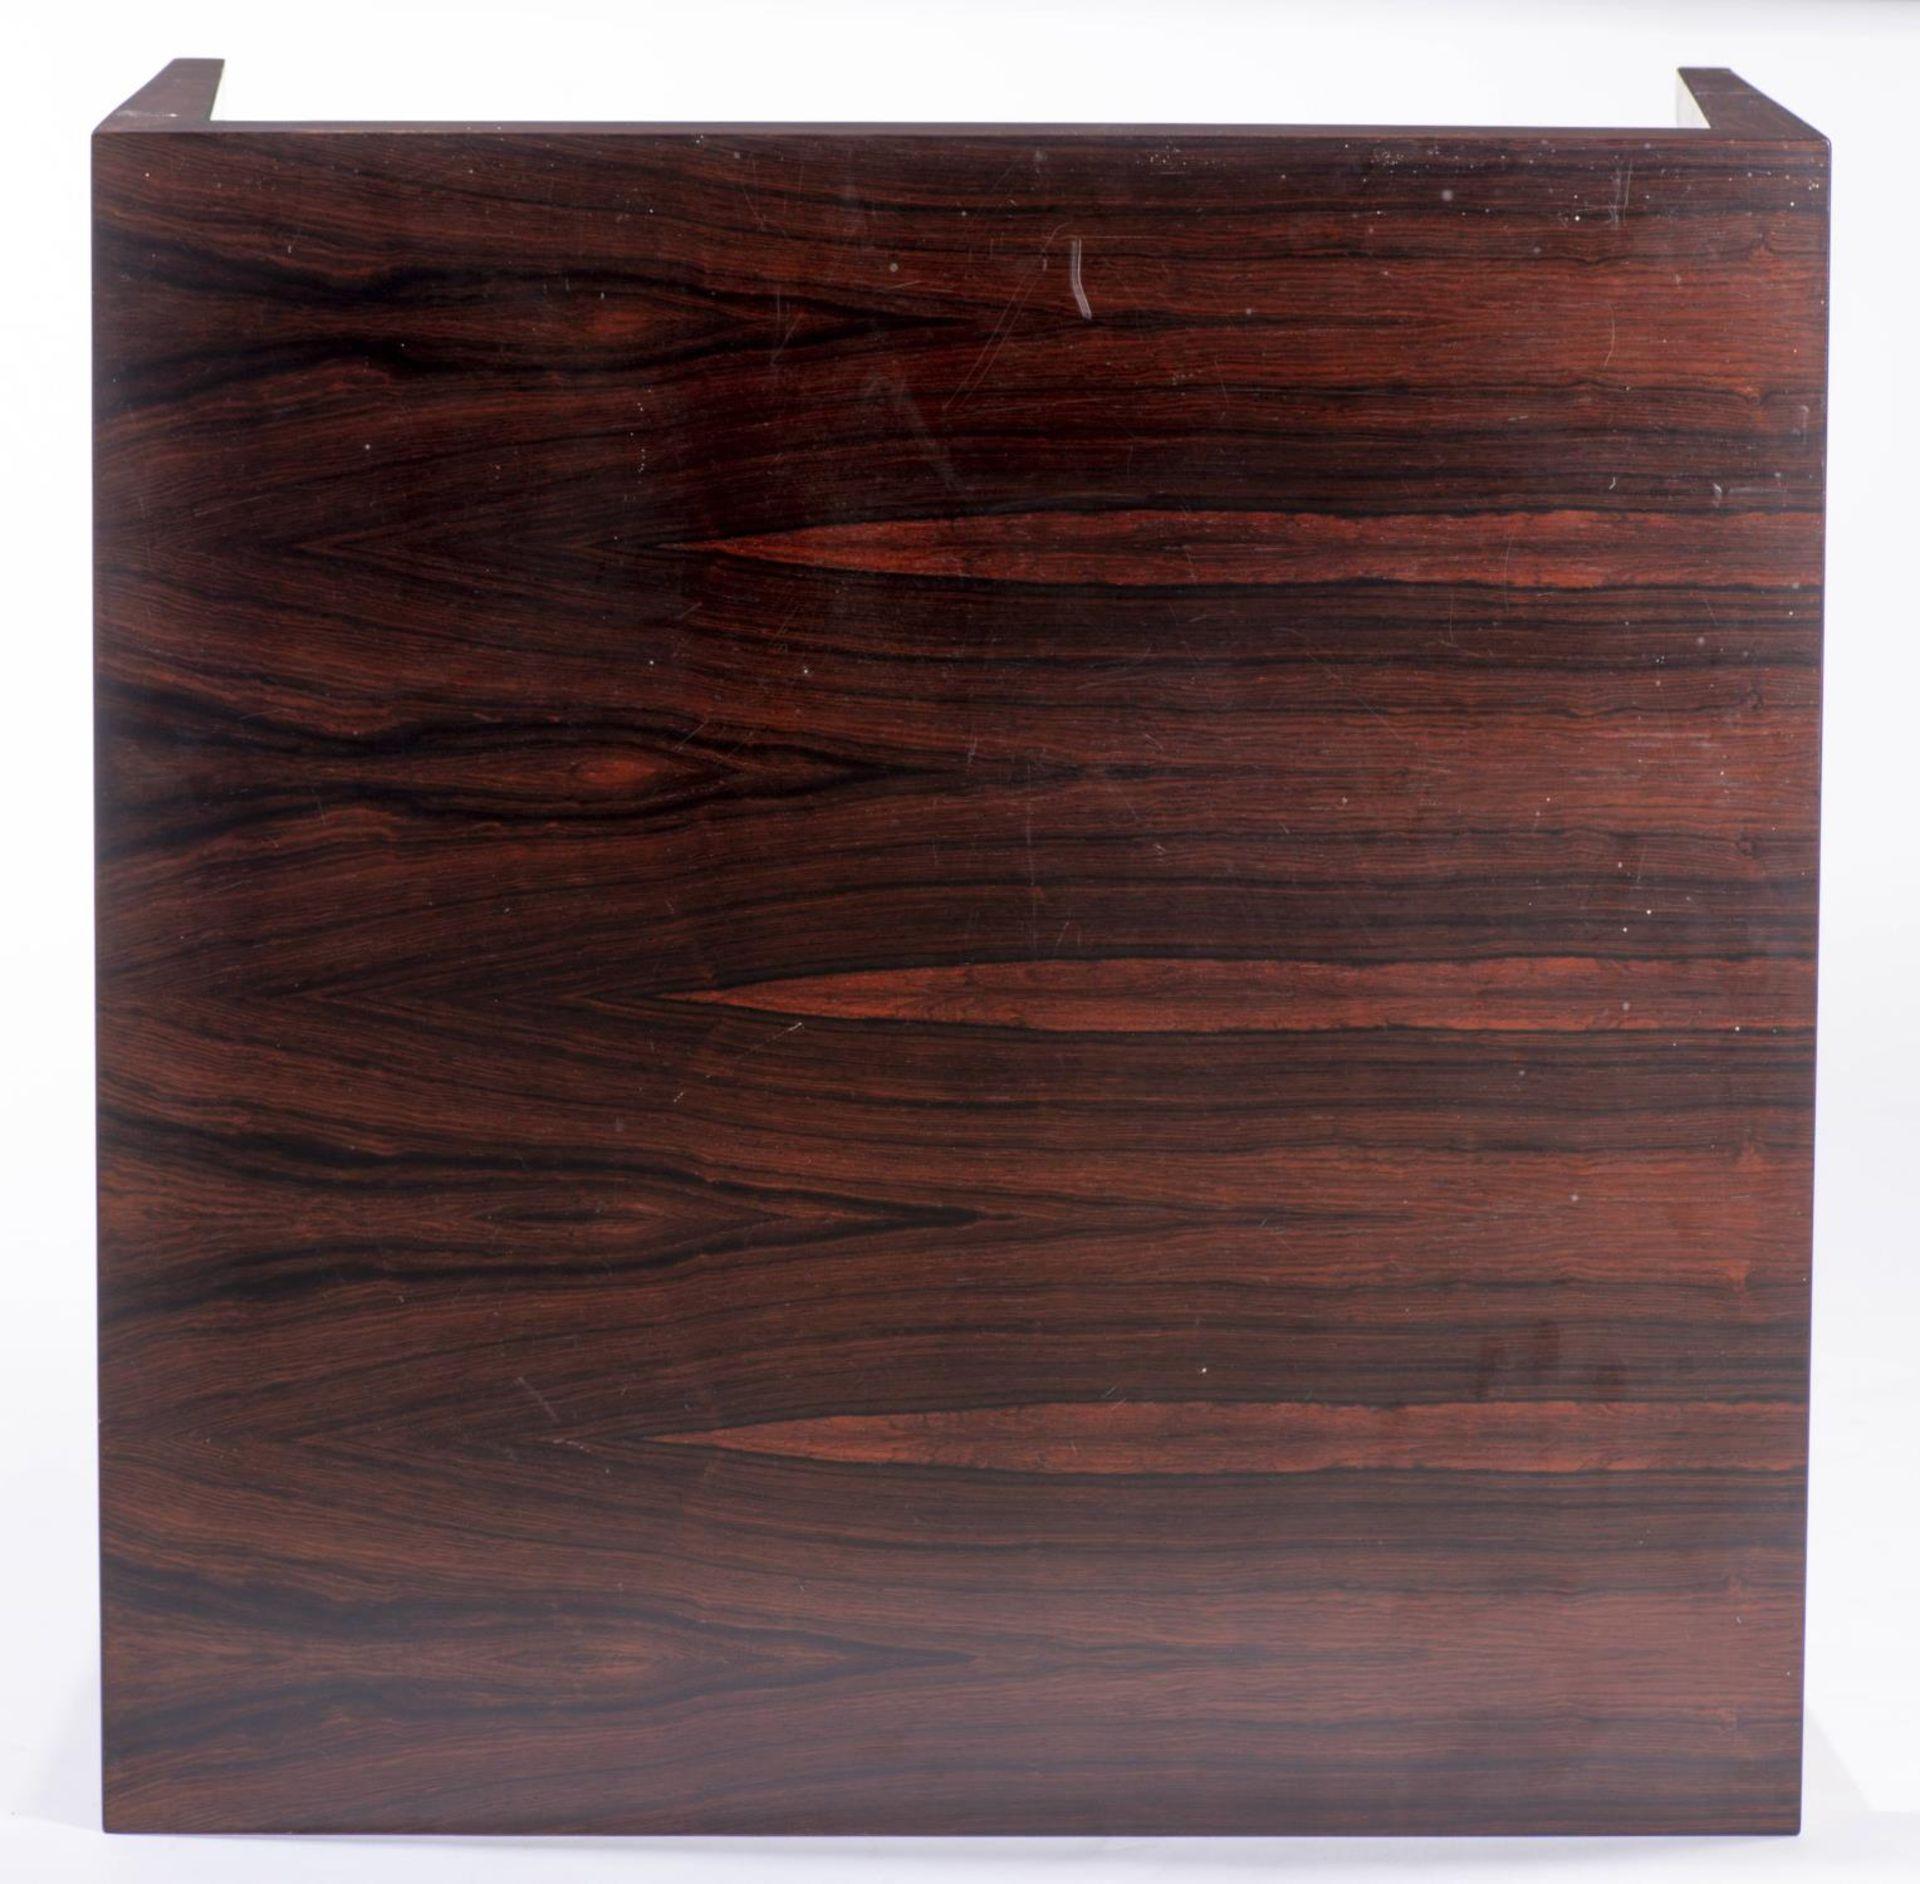 Table basse carrée en teck par Haslev Mobelsnedkeri A/S DK Haslev Fa. Ole Olsson & Son - Bild 3 aus 4